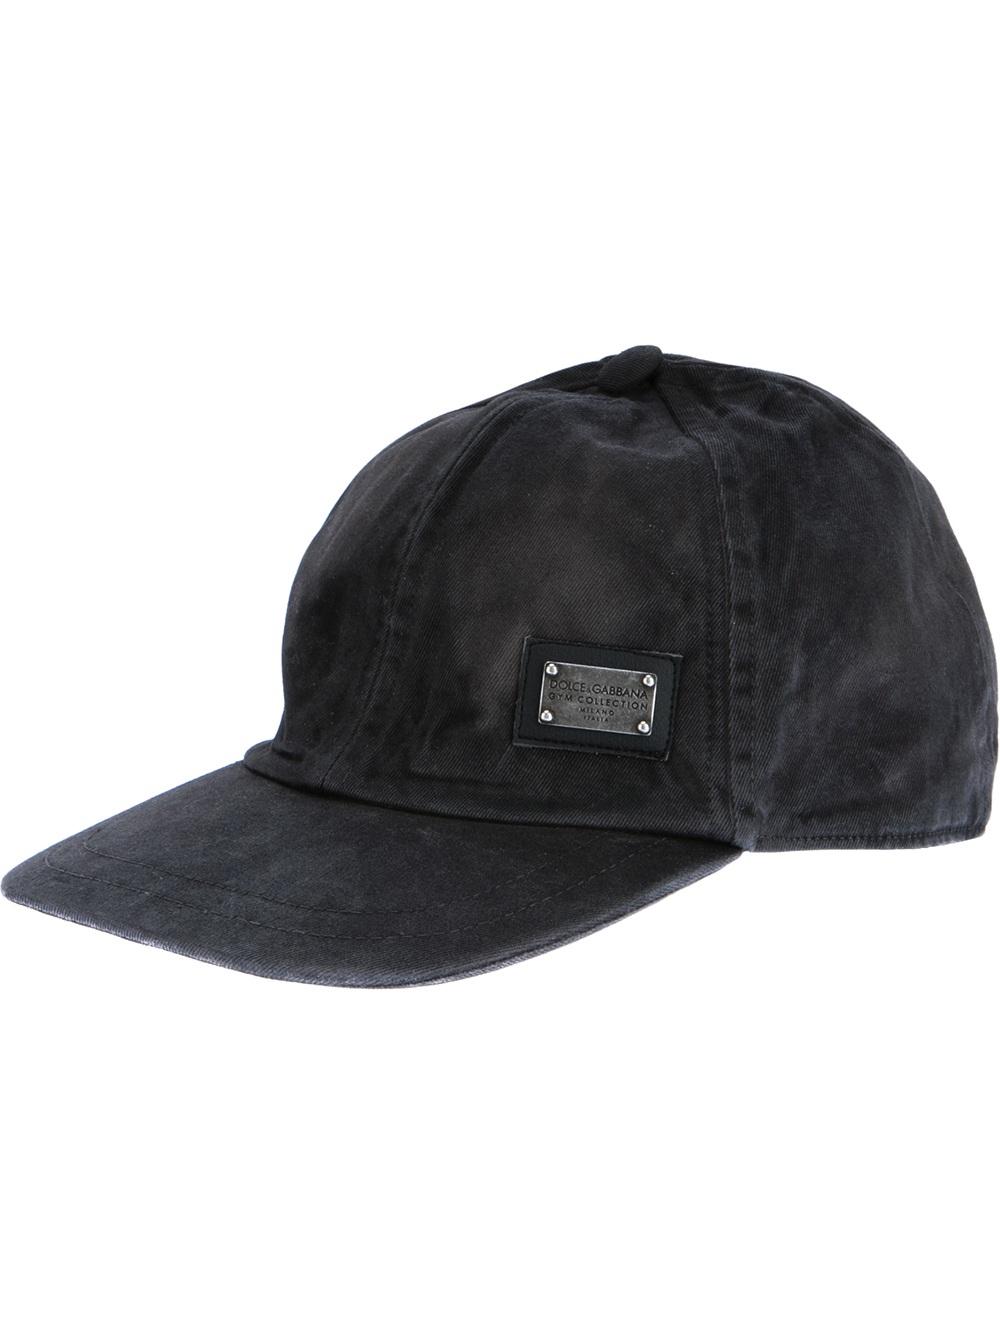 Lyst - Dolce   Gabbana Baseball Cap in Black for Men ebaf2c9fc7a